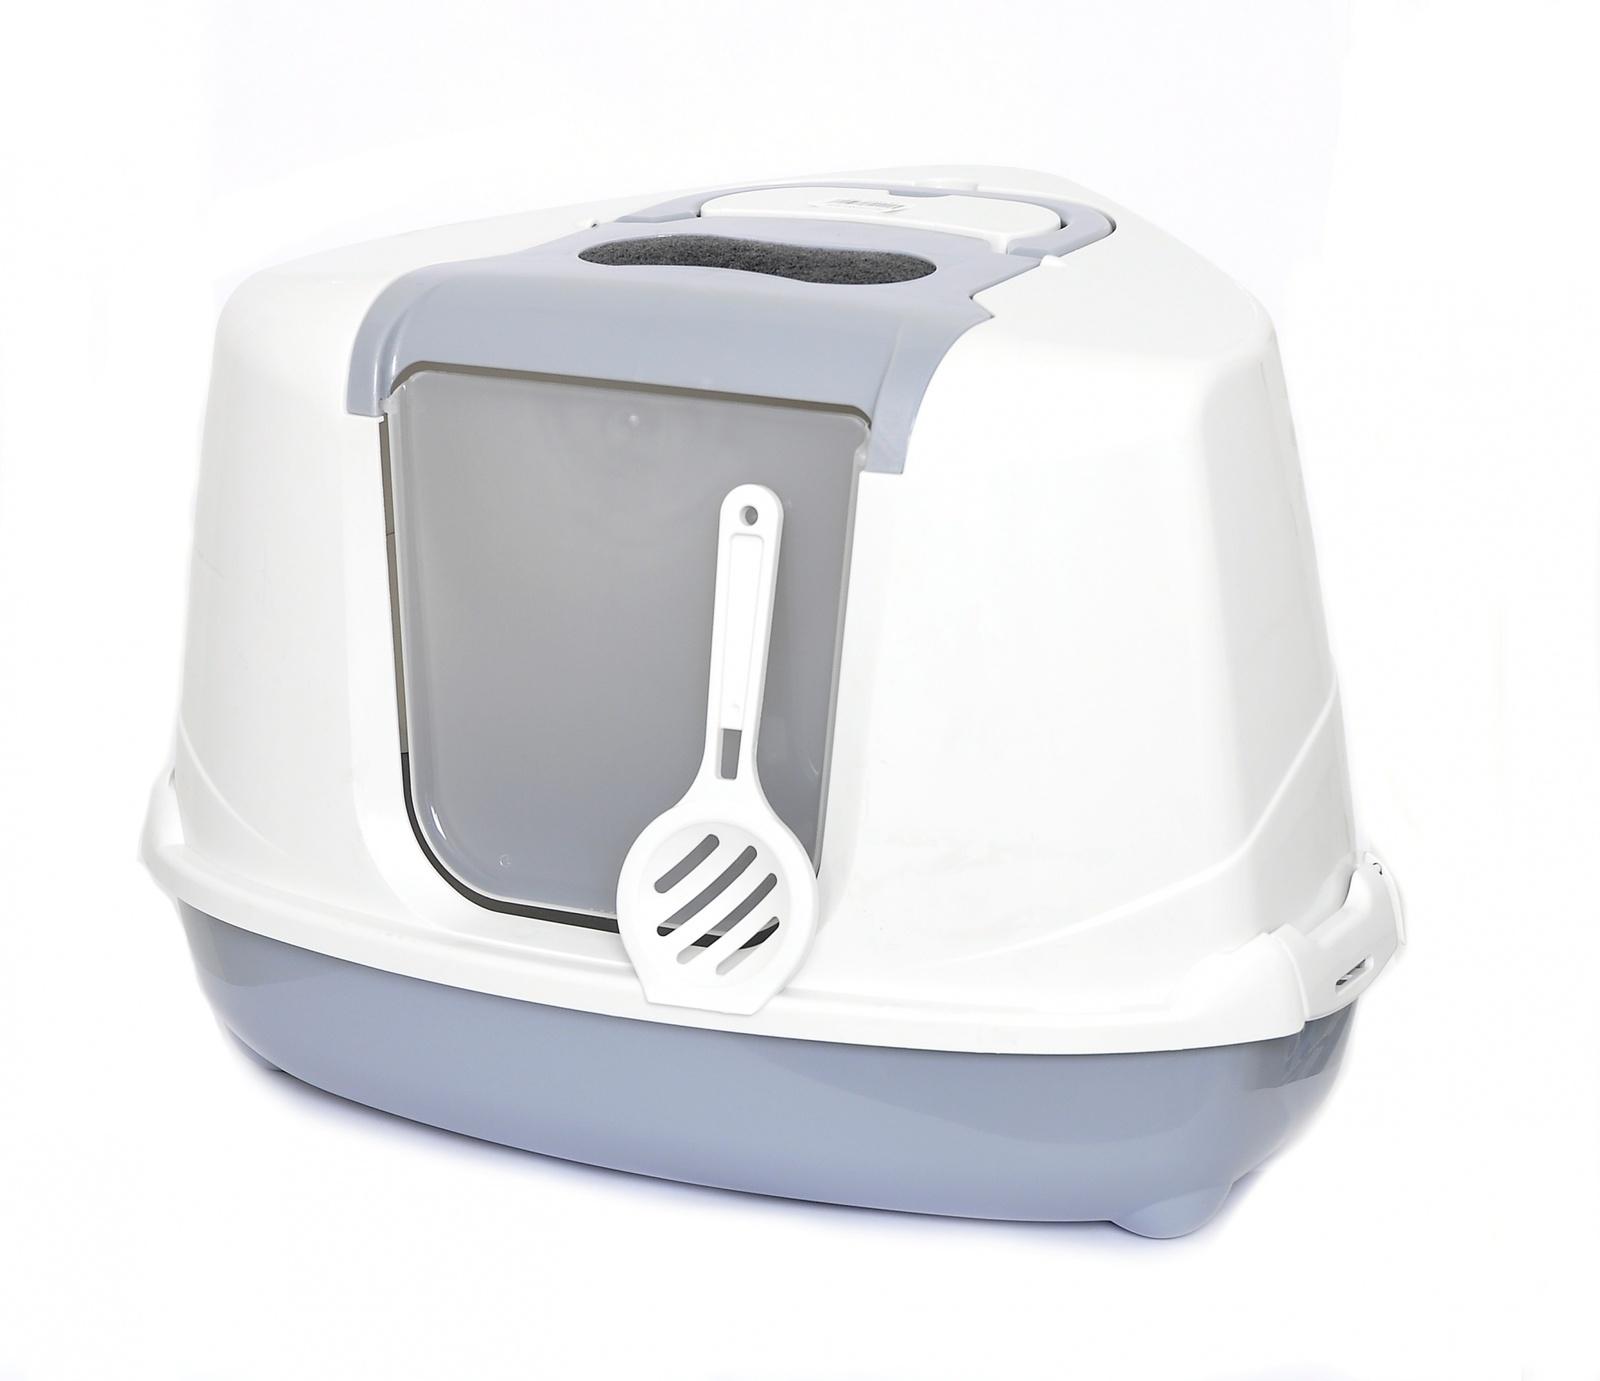 Benelux Угловой кошачий туалет 56 * 45 * 39 см H (Astro cat toilet classic mix with filter. door en) 54422Туалеты для животных<br><br><br>Артикул: 20391<br>Бренд: Benelux<br>Вес брутто (кг): 1,5